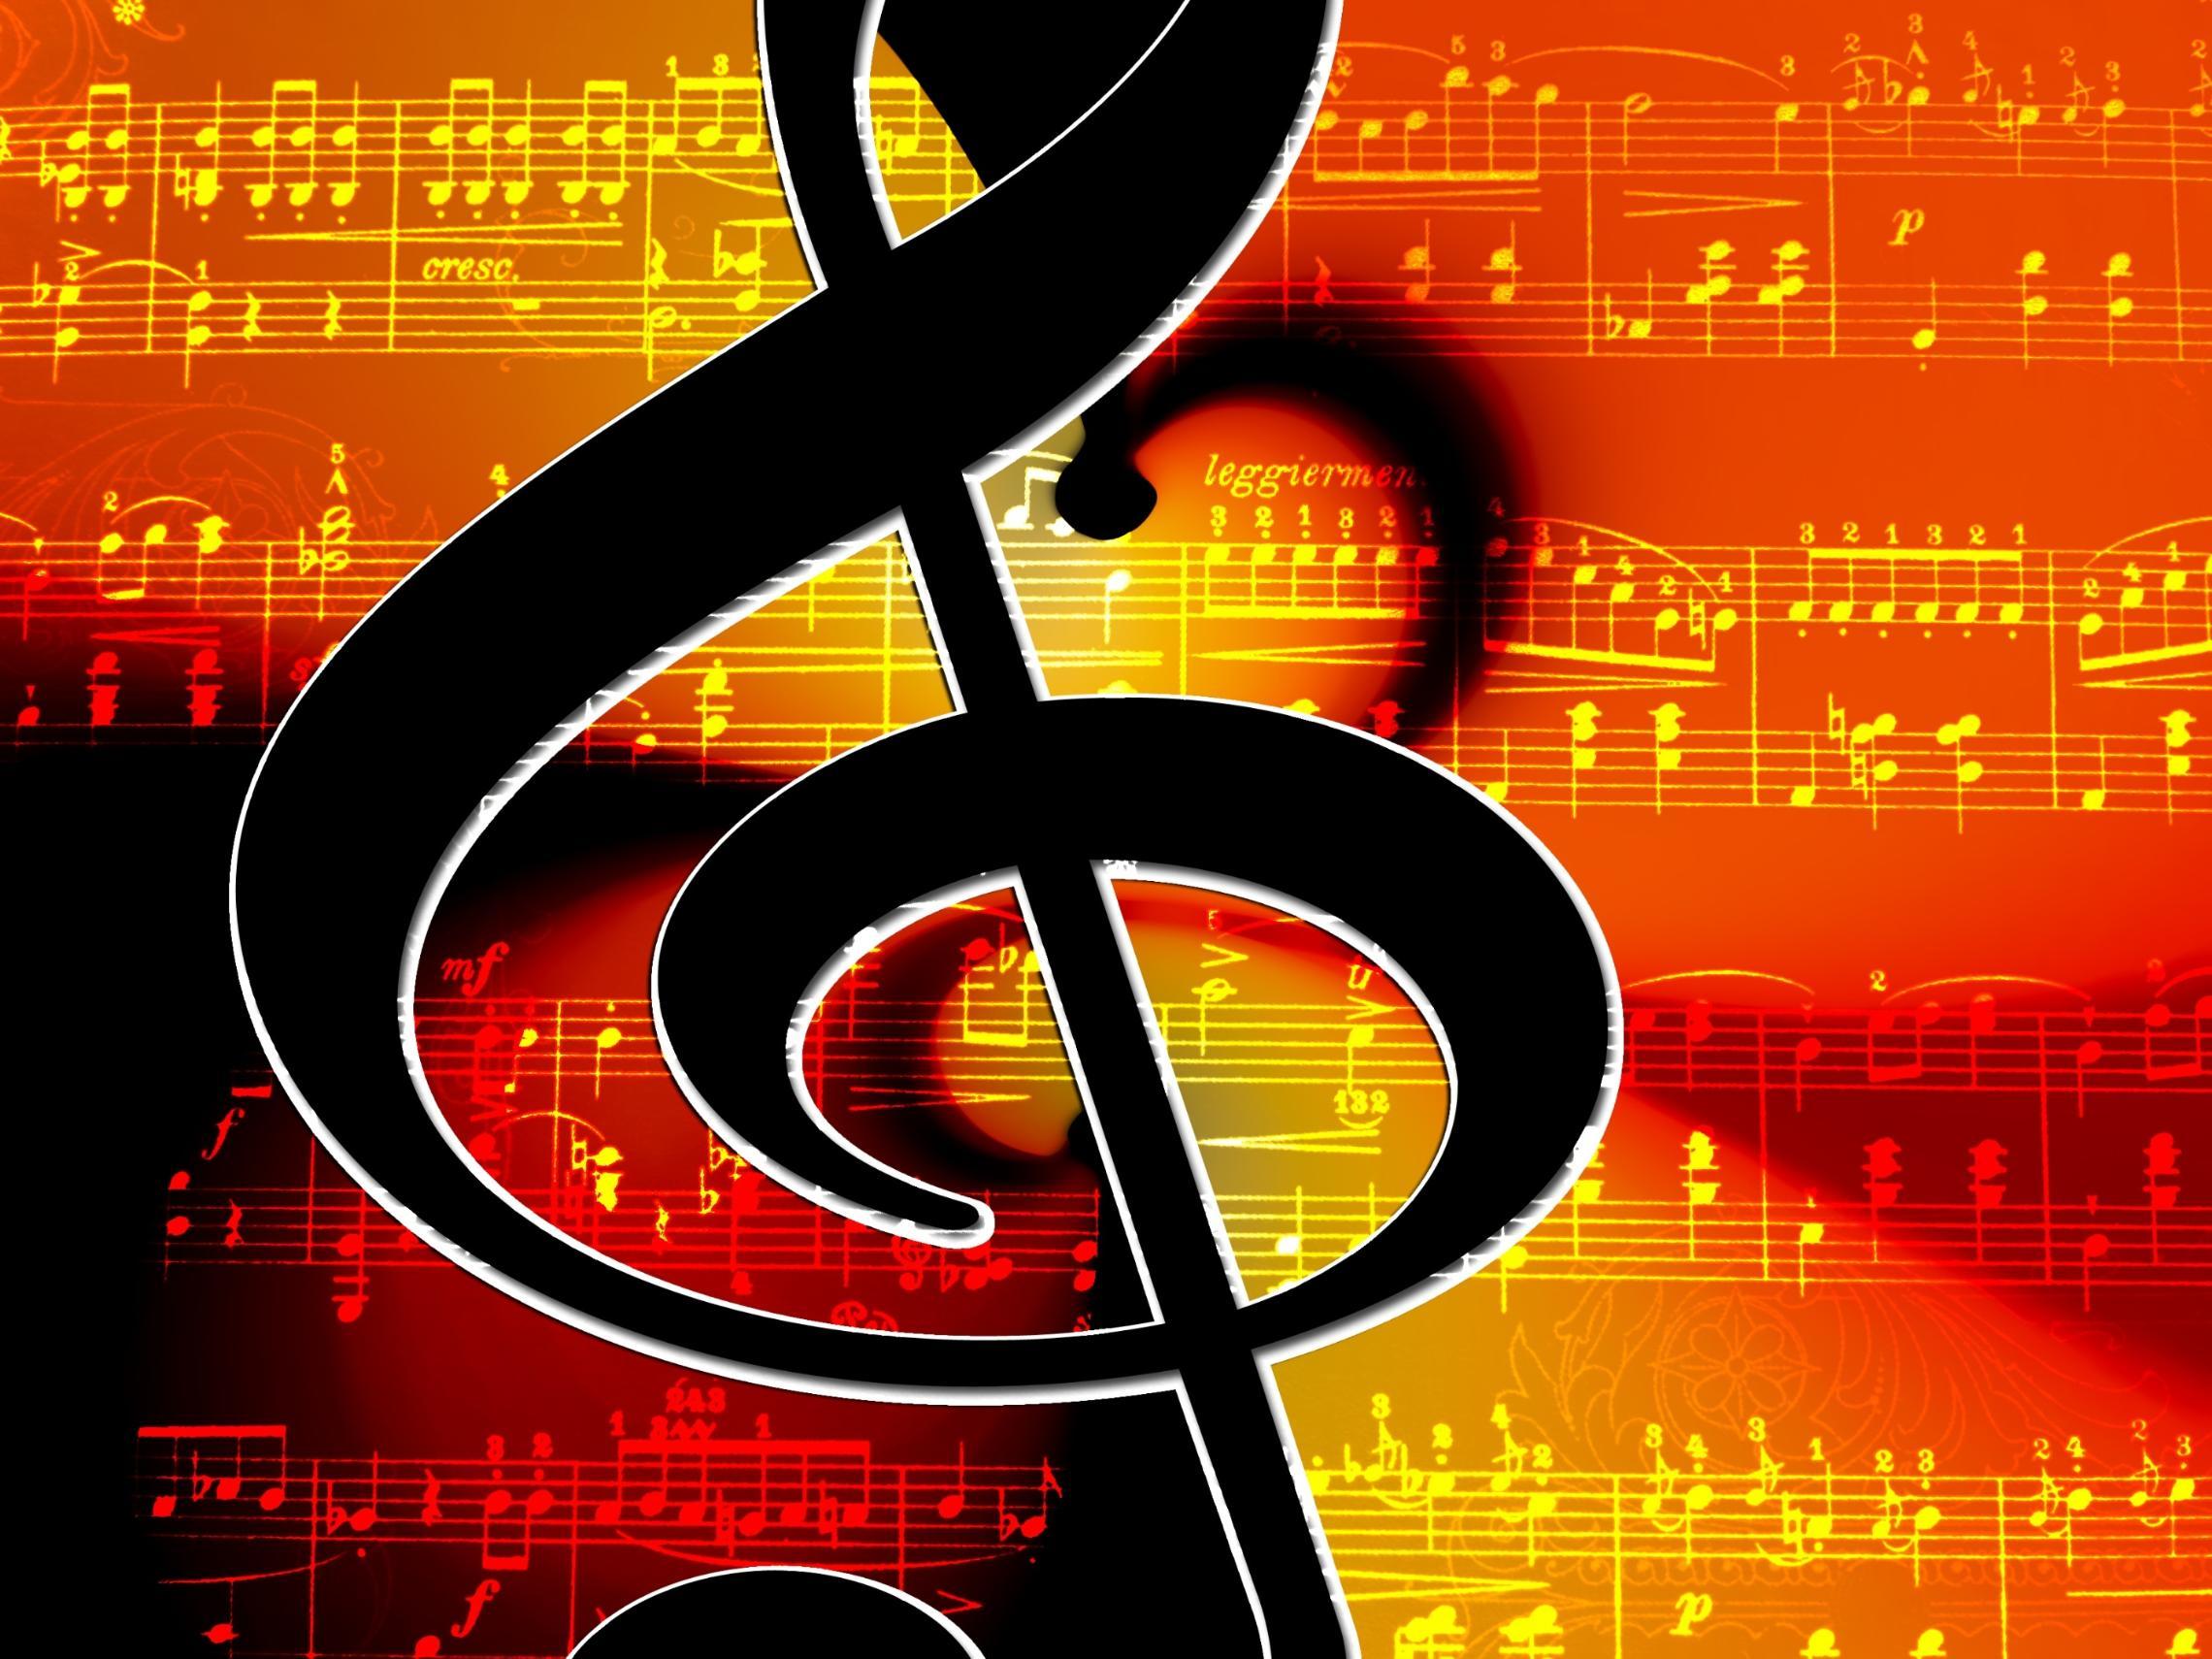 Notenschlüssel (c) www.pixabay.com